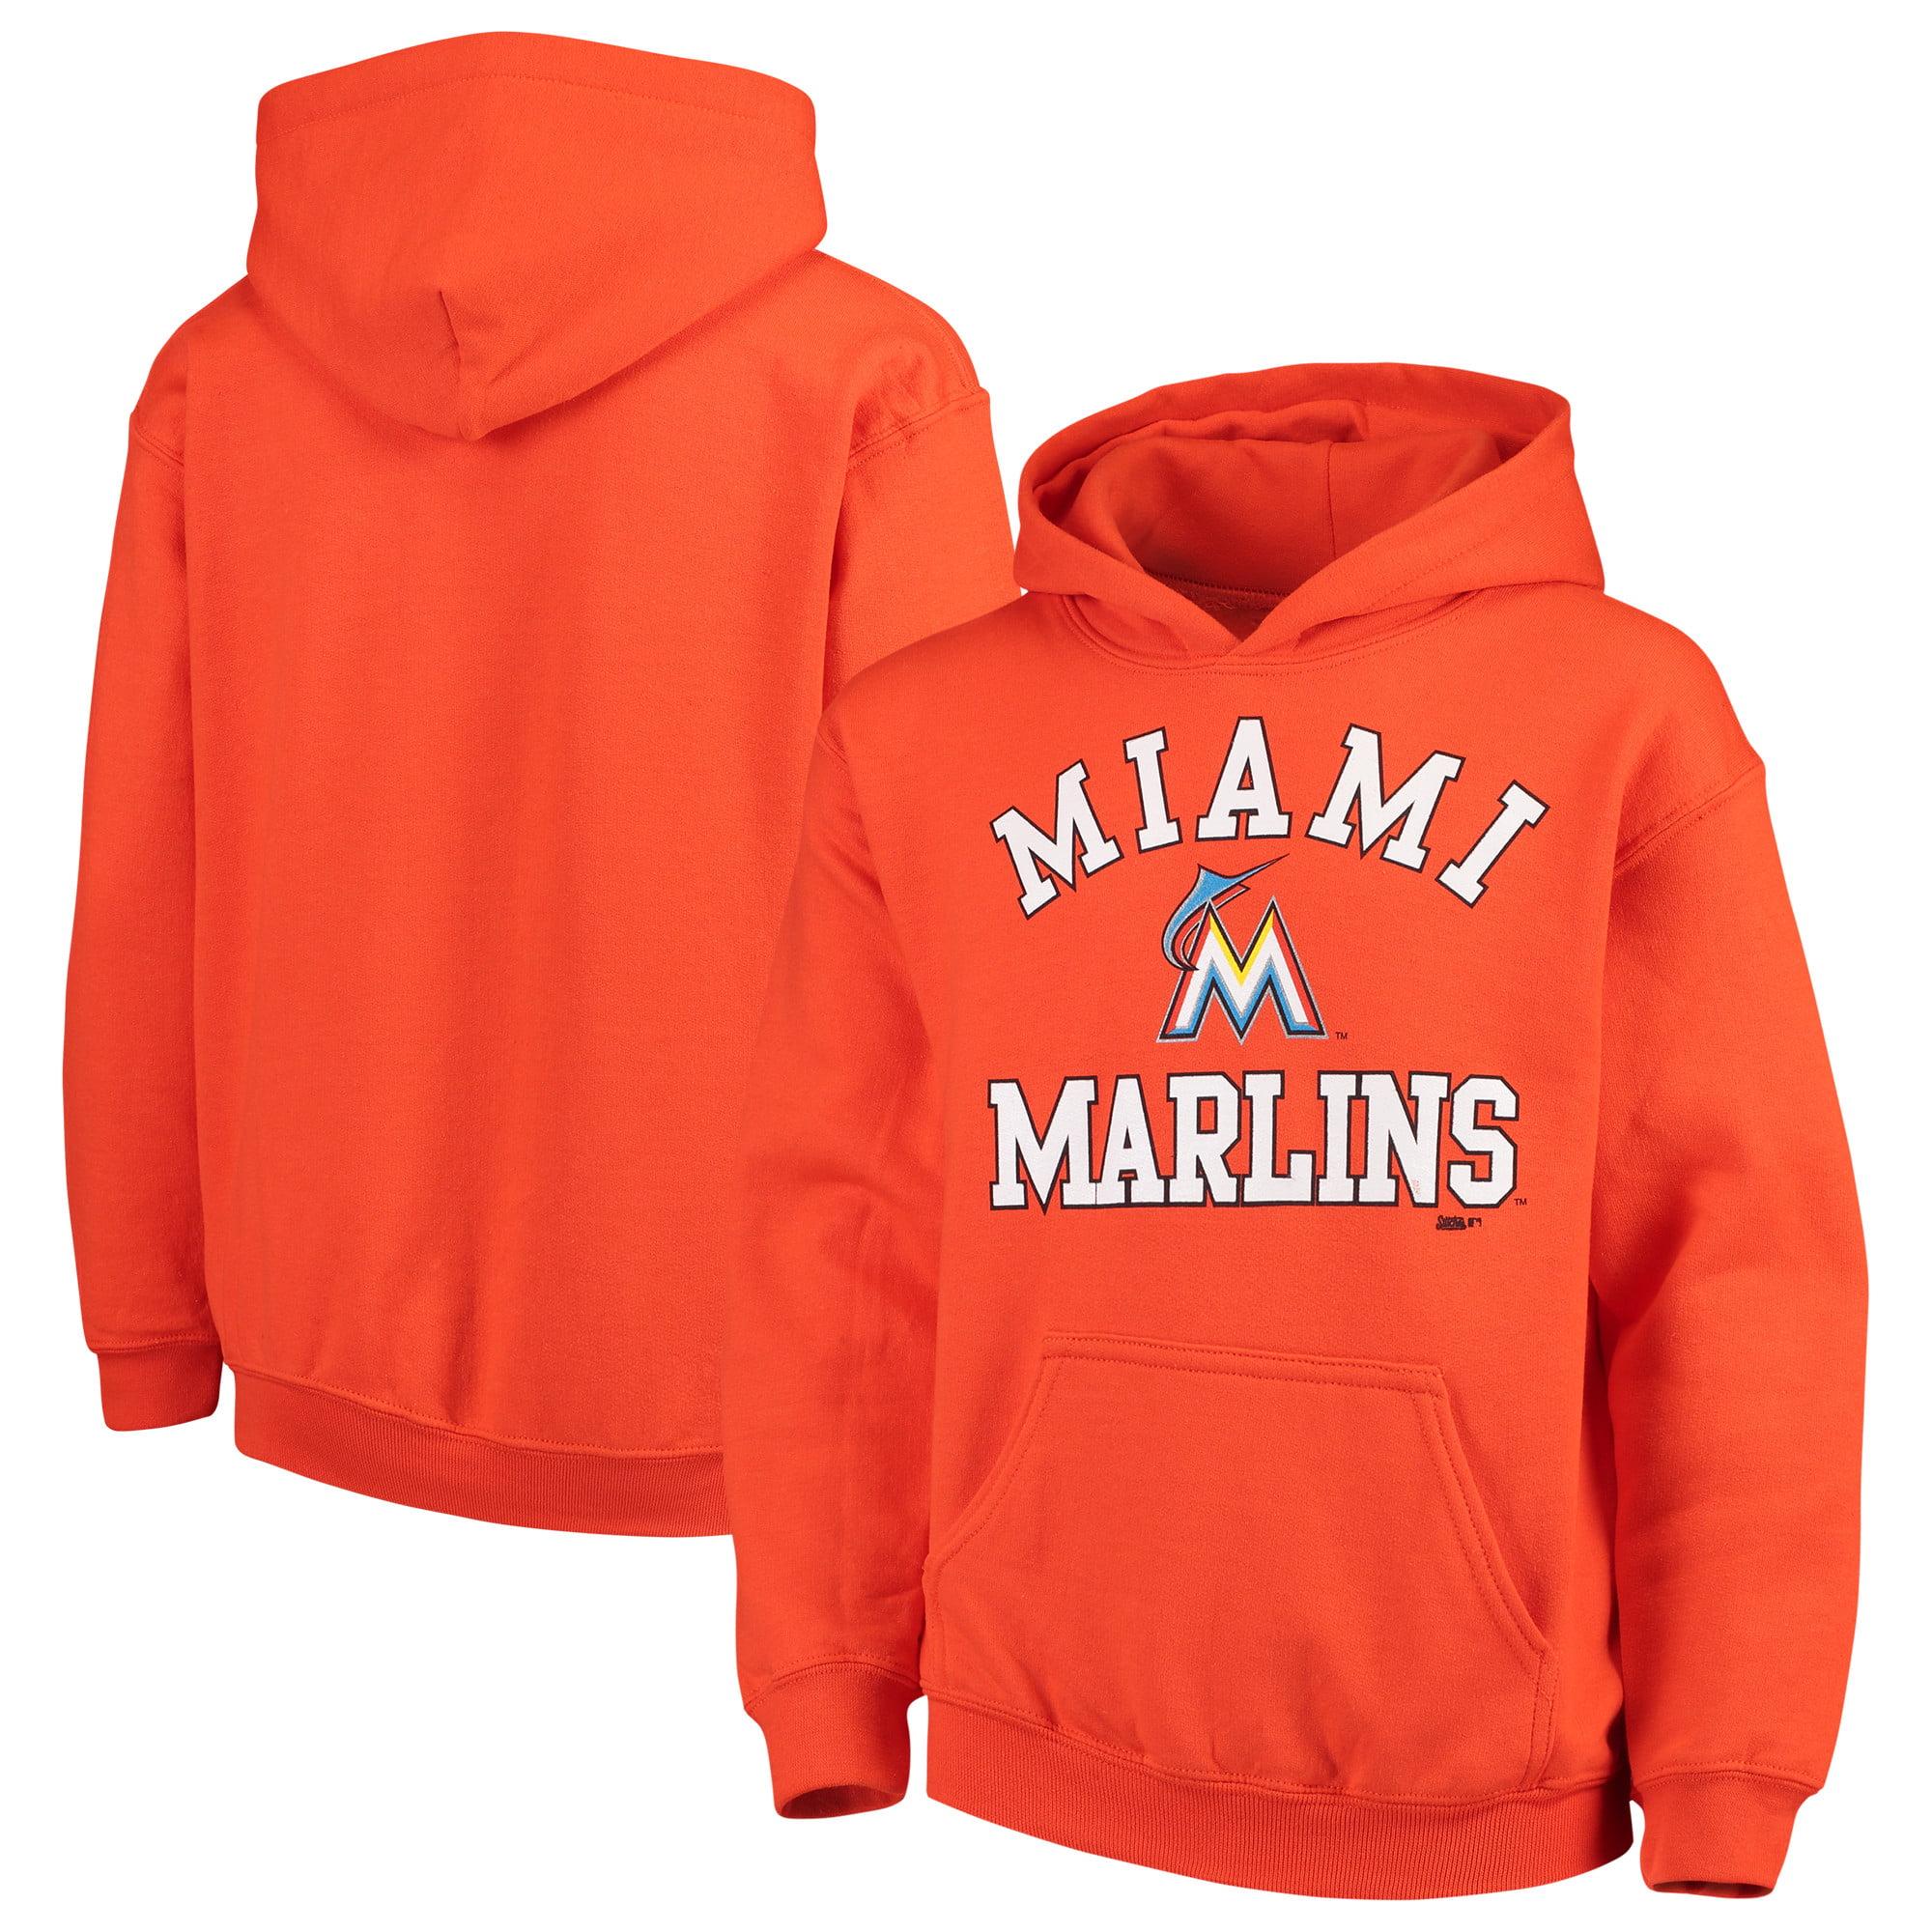 Miami Marlins Stitches Youth Fleece Pullover Hoodie - Orange